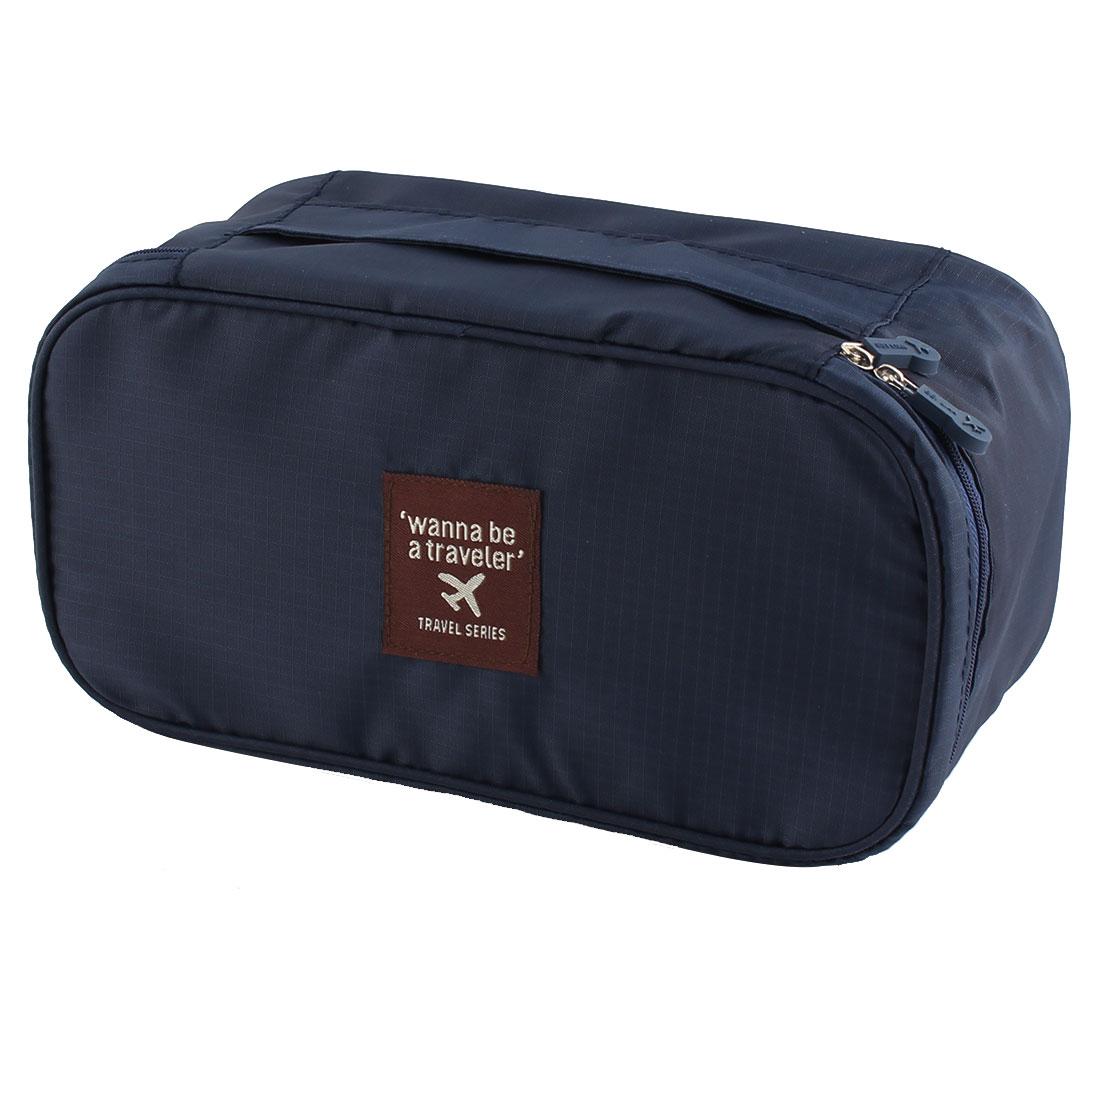 Travelling Business Trip Socks Underwear Bra Organizer Packing Bag Case Container Navy Blue